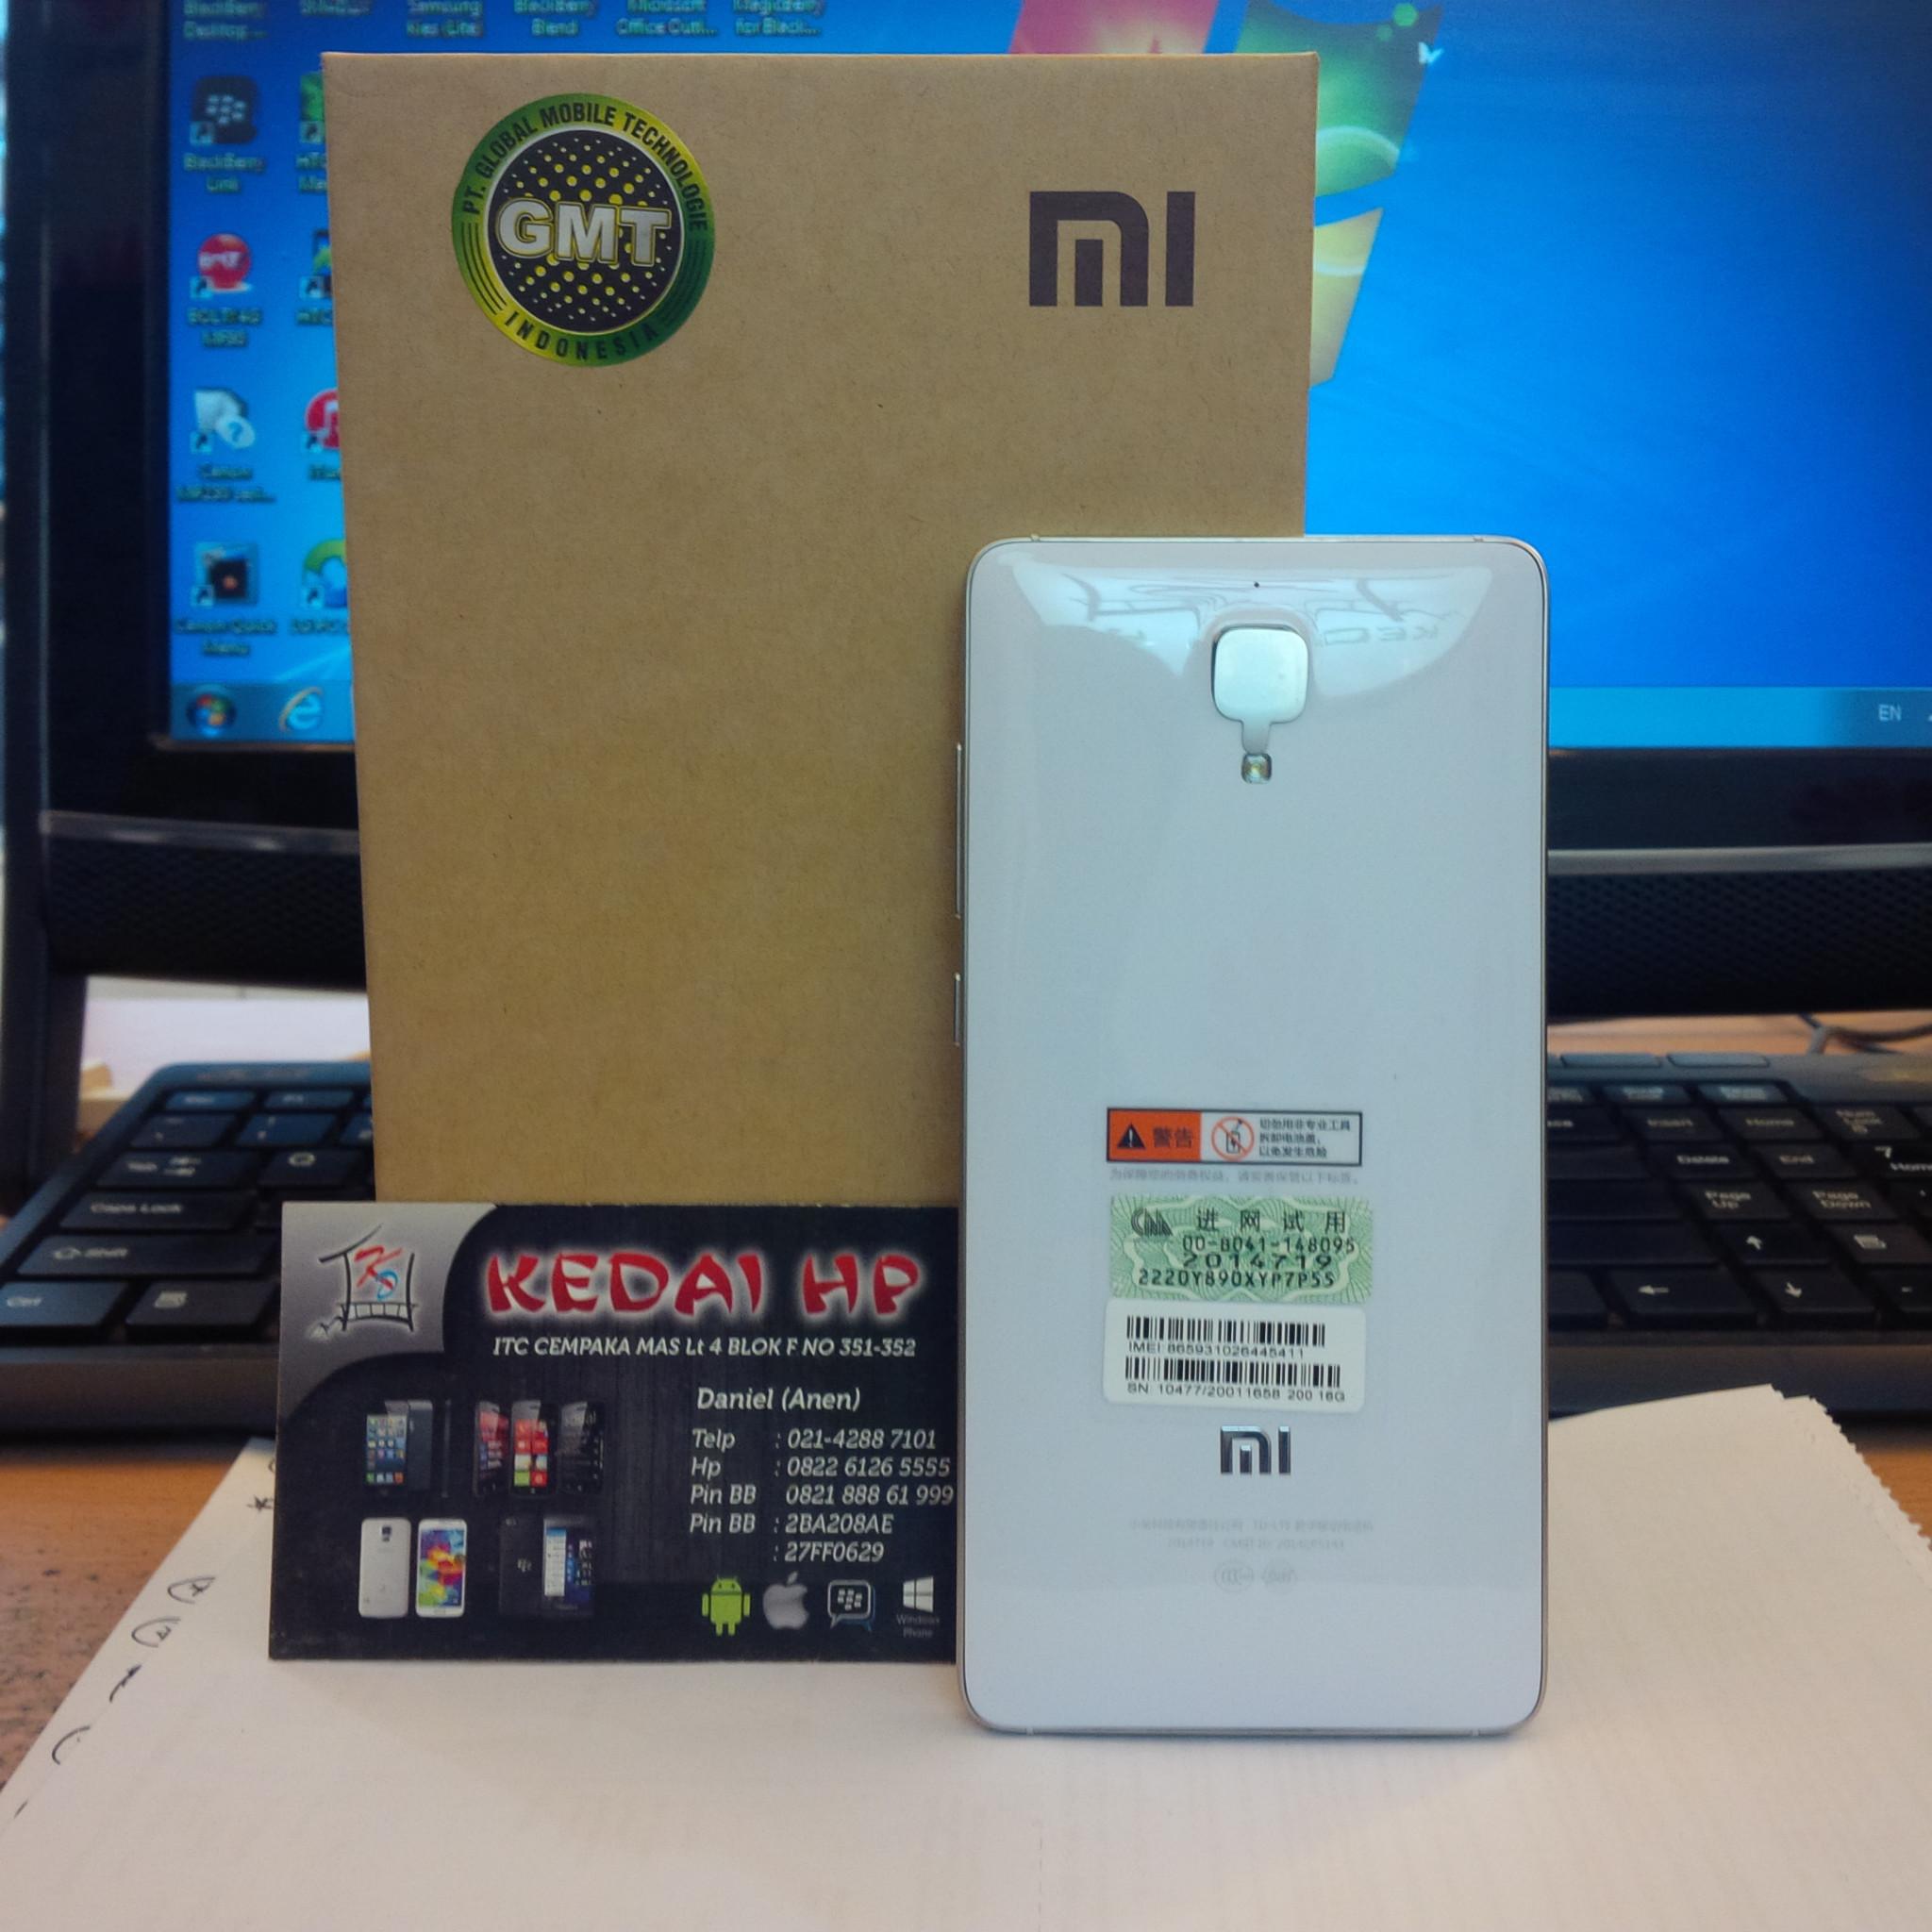 Xiaomi Mi4 Ram 2gb By Jual 4g Lte Garansi Distributor 1 Tahun